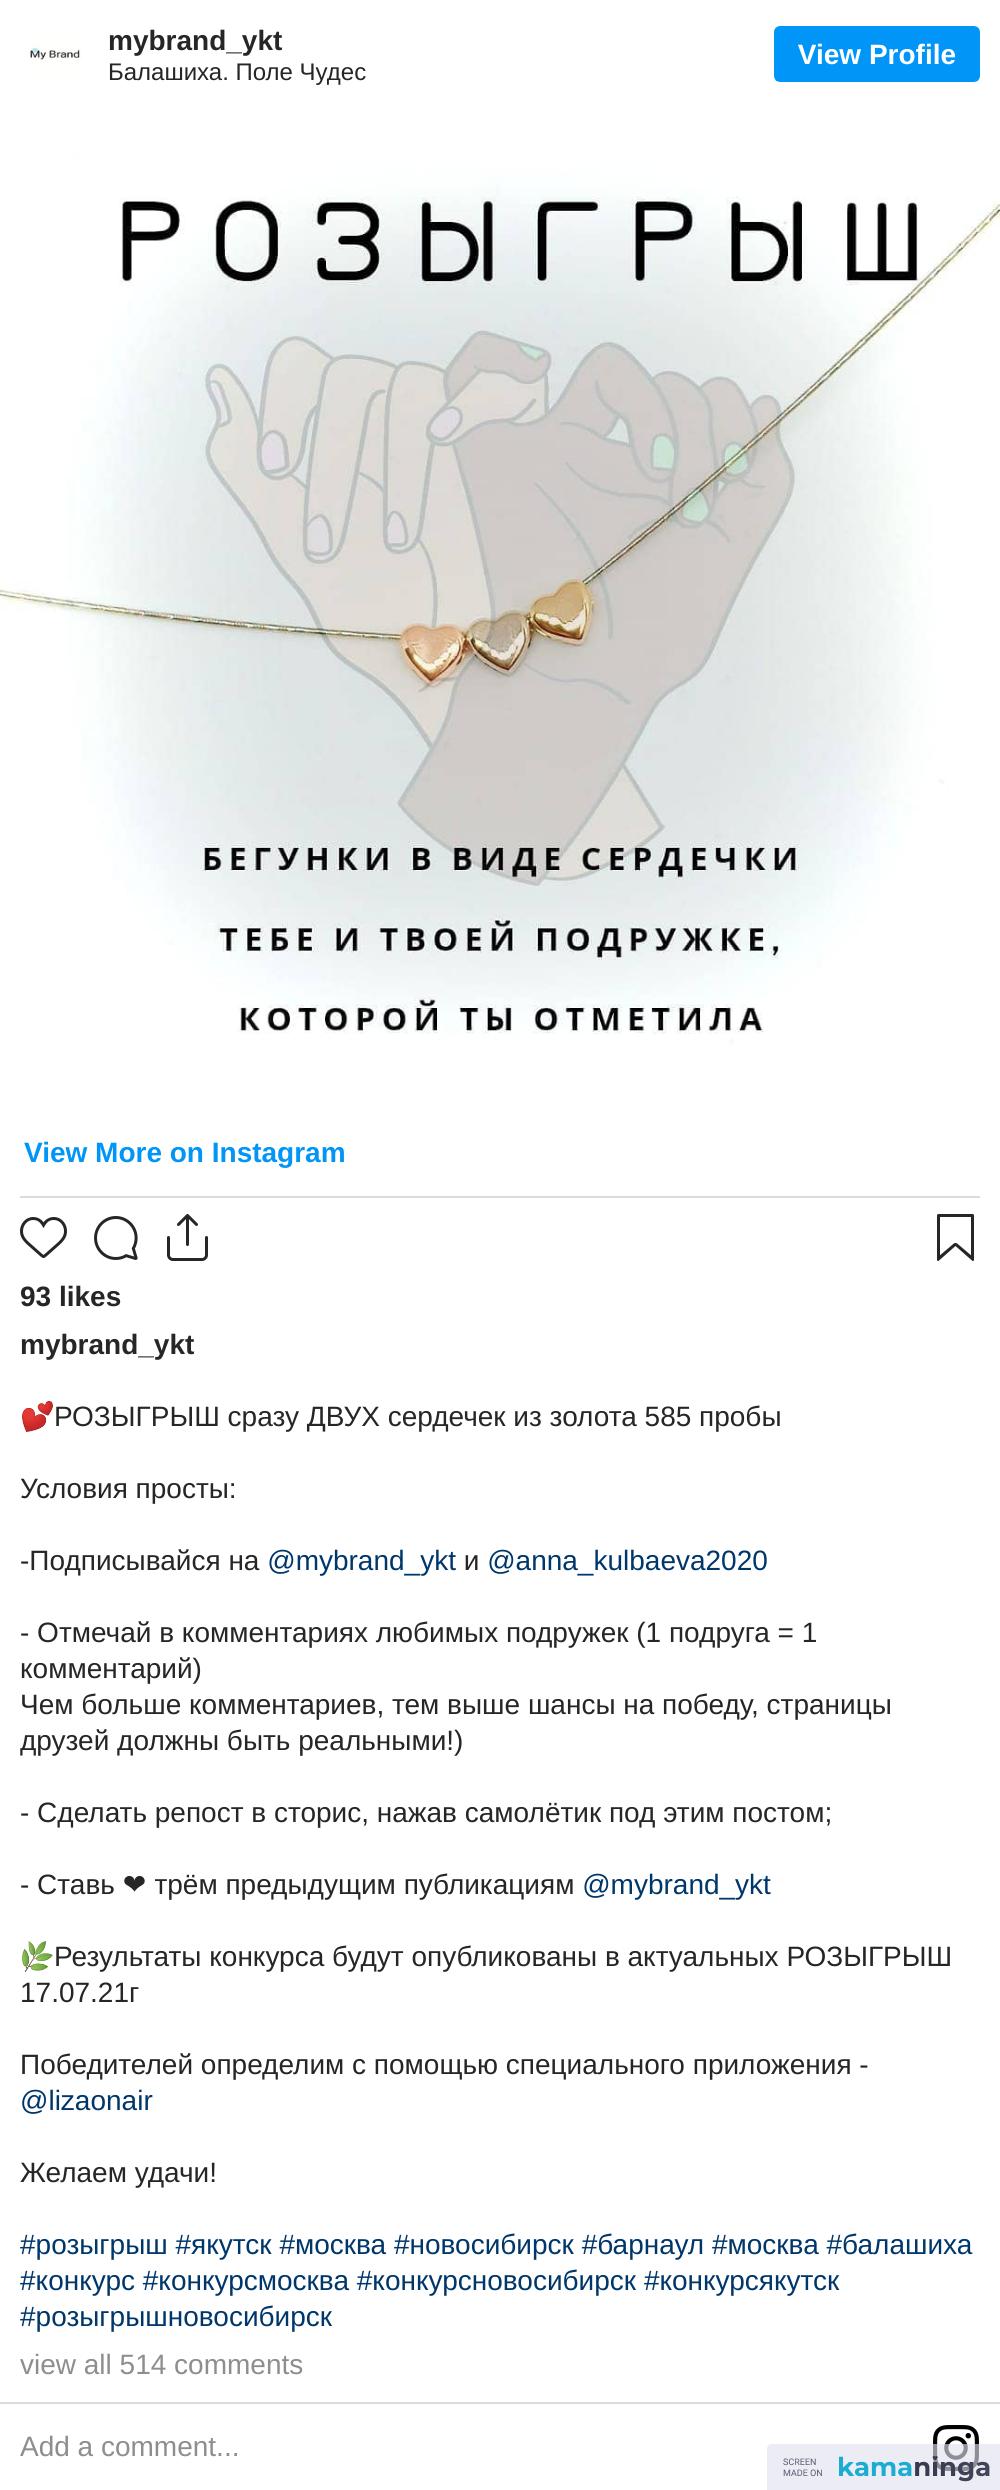 https://www.instagram.com/p/CQy4esHMAaQ/